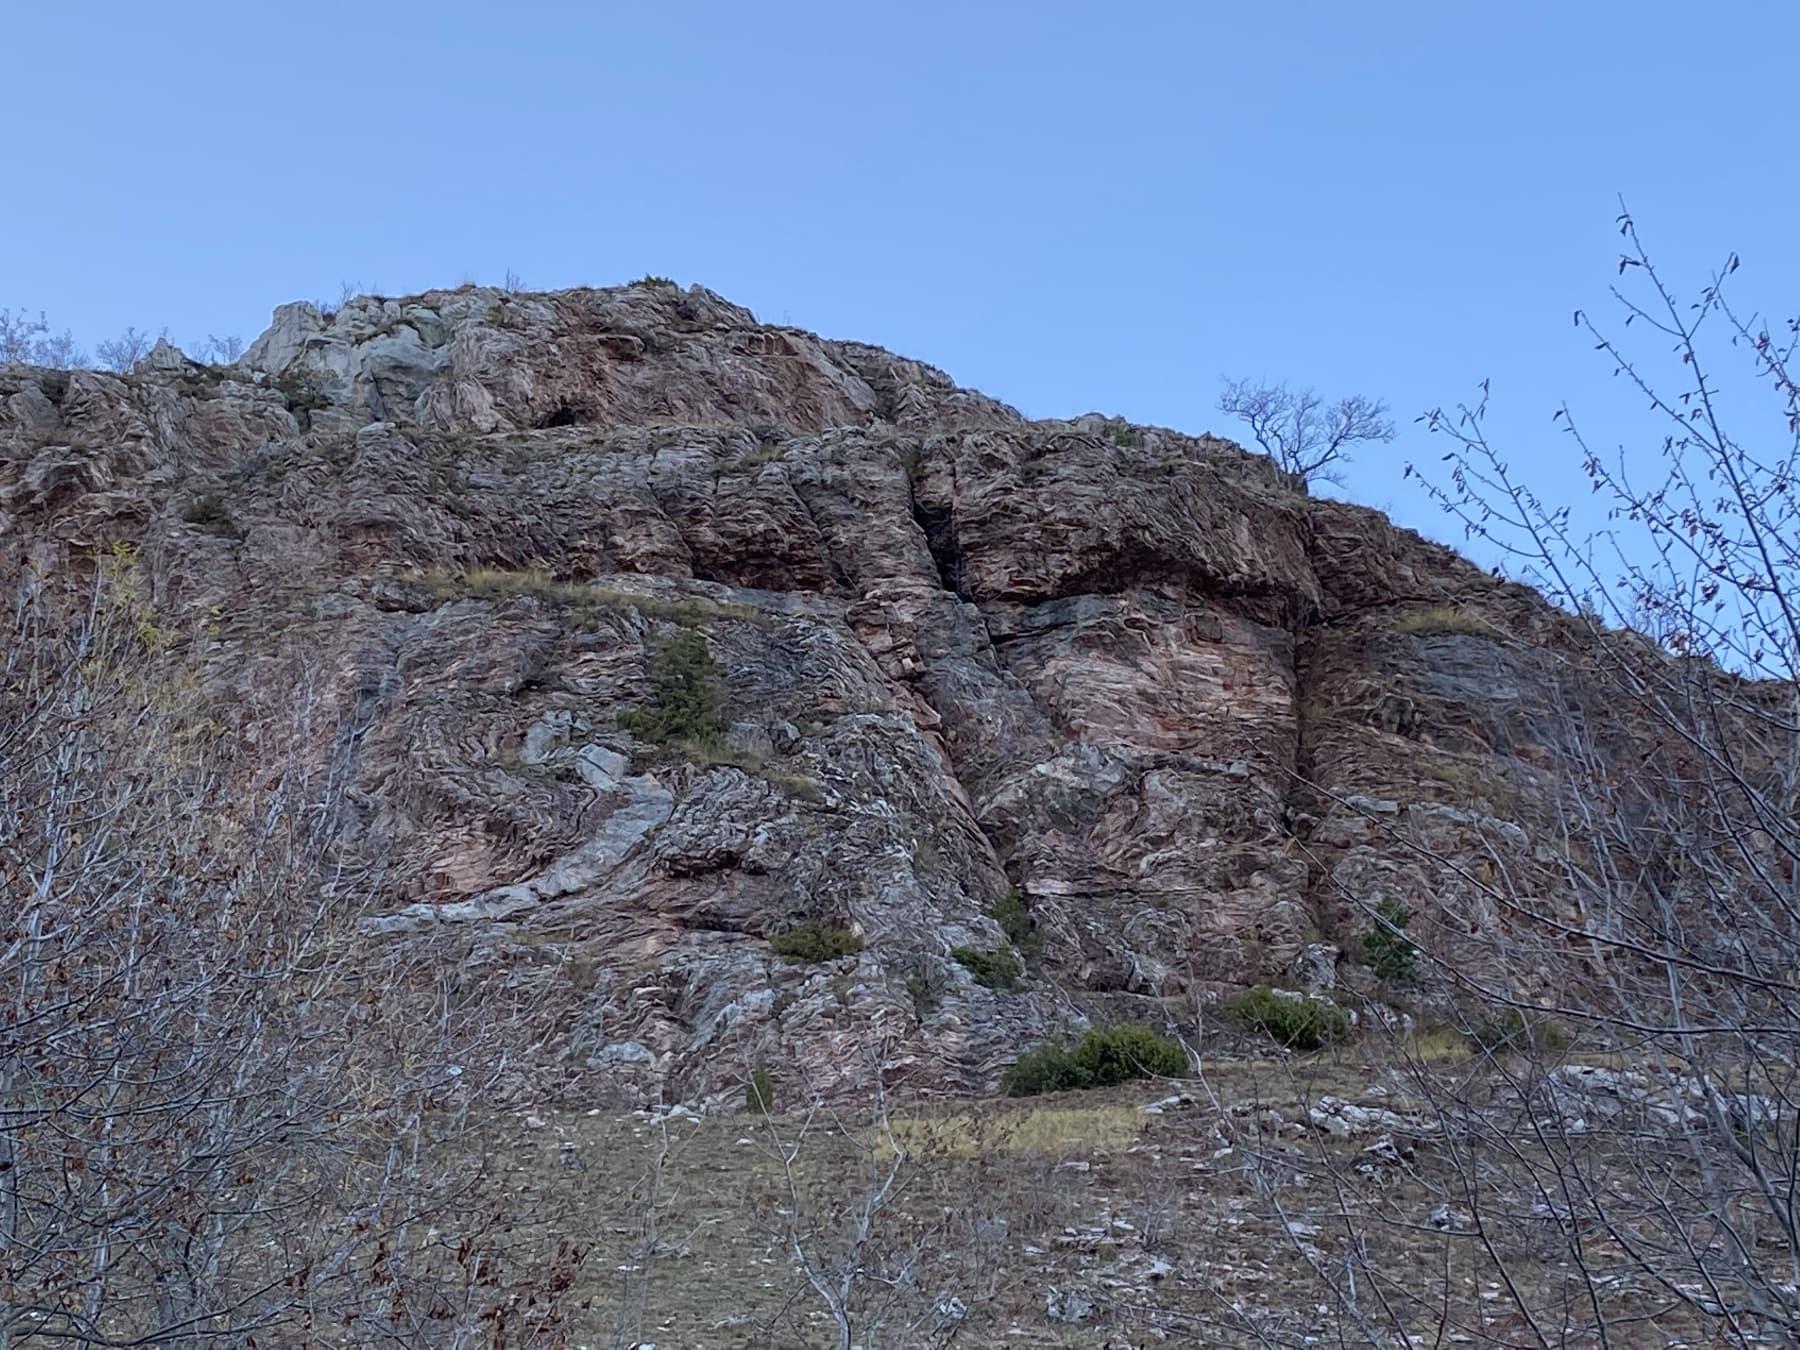 Mountain Village Umoljani - In Search of the Stone Dragon 8